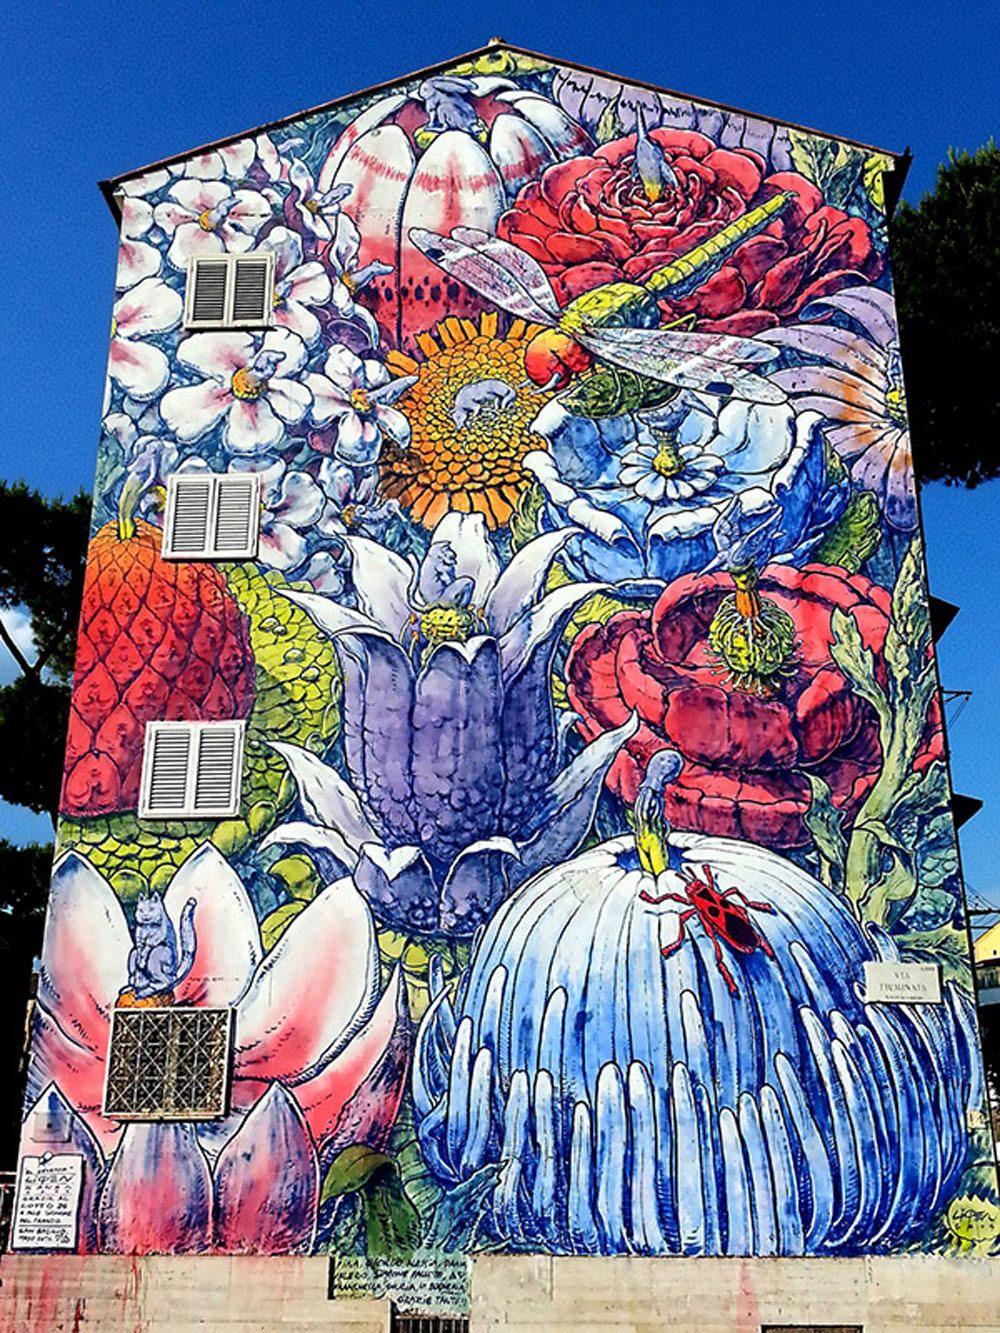 El Devenir by Liqen – Quartiere San Basilio, Roma | 30 Cool Street Art